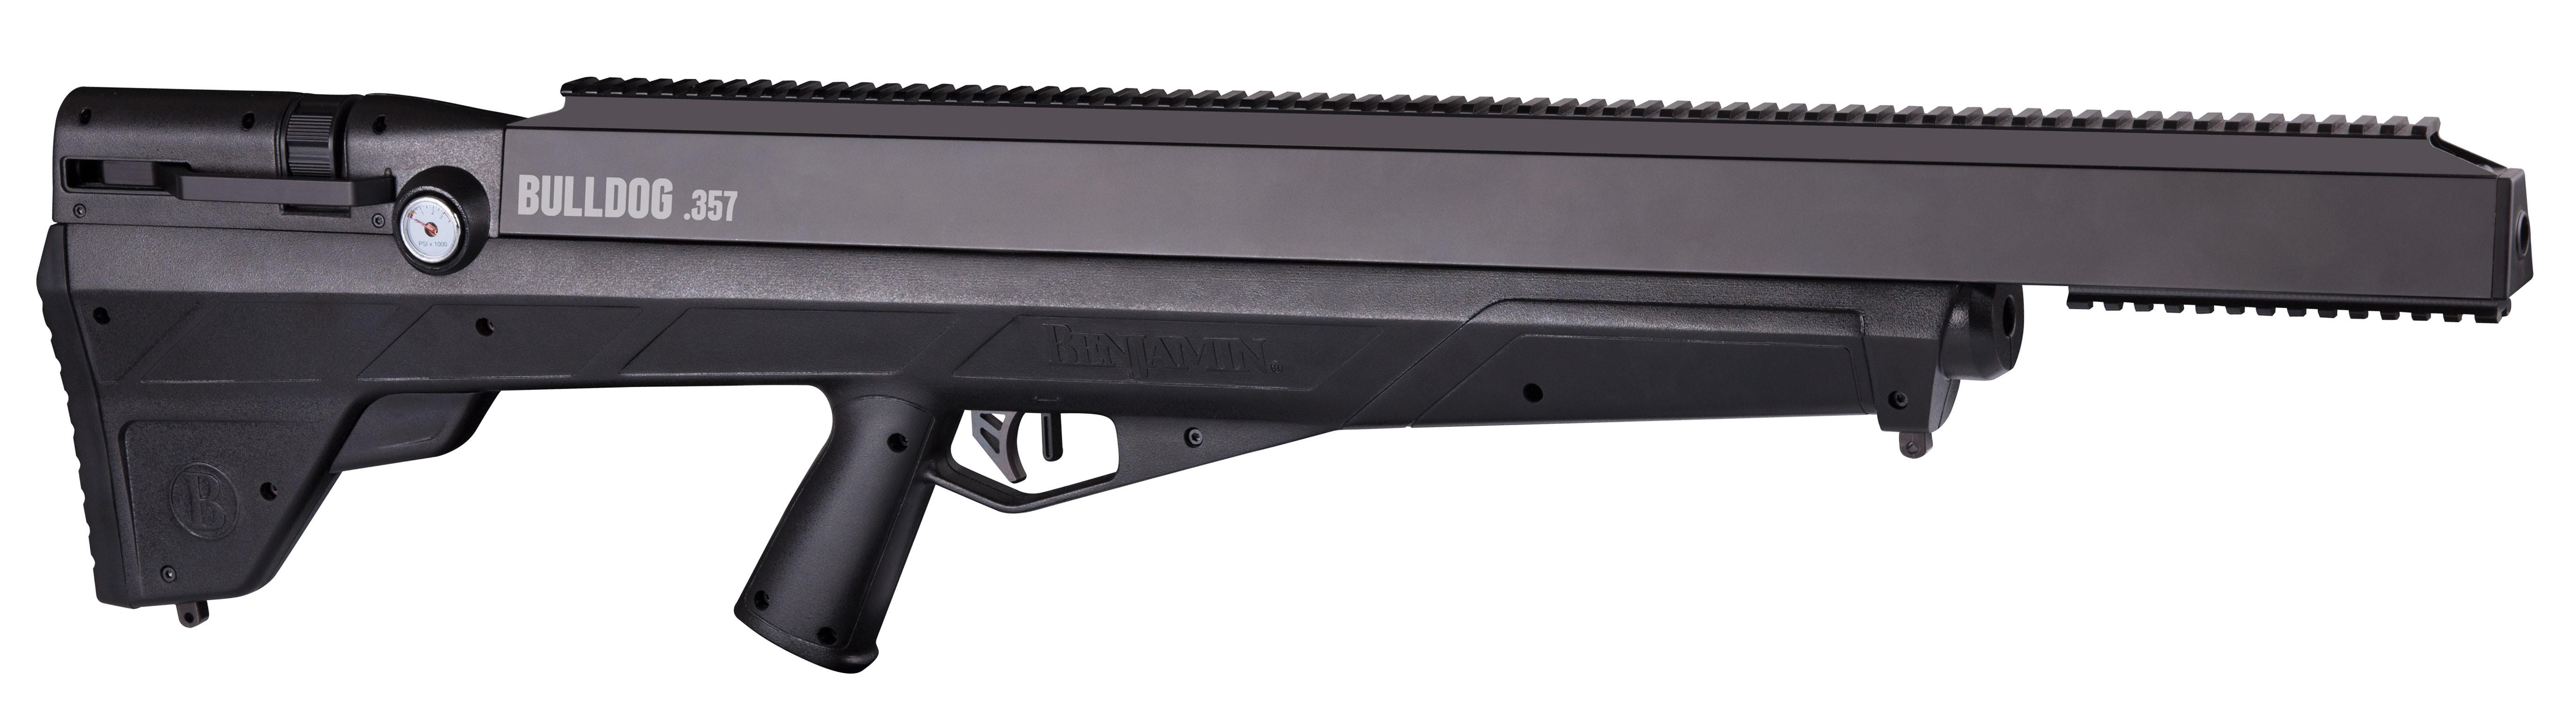 Crosman Bulldog  357 PCP Hunting Rifle FAC Black